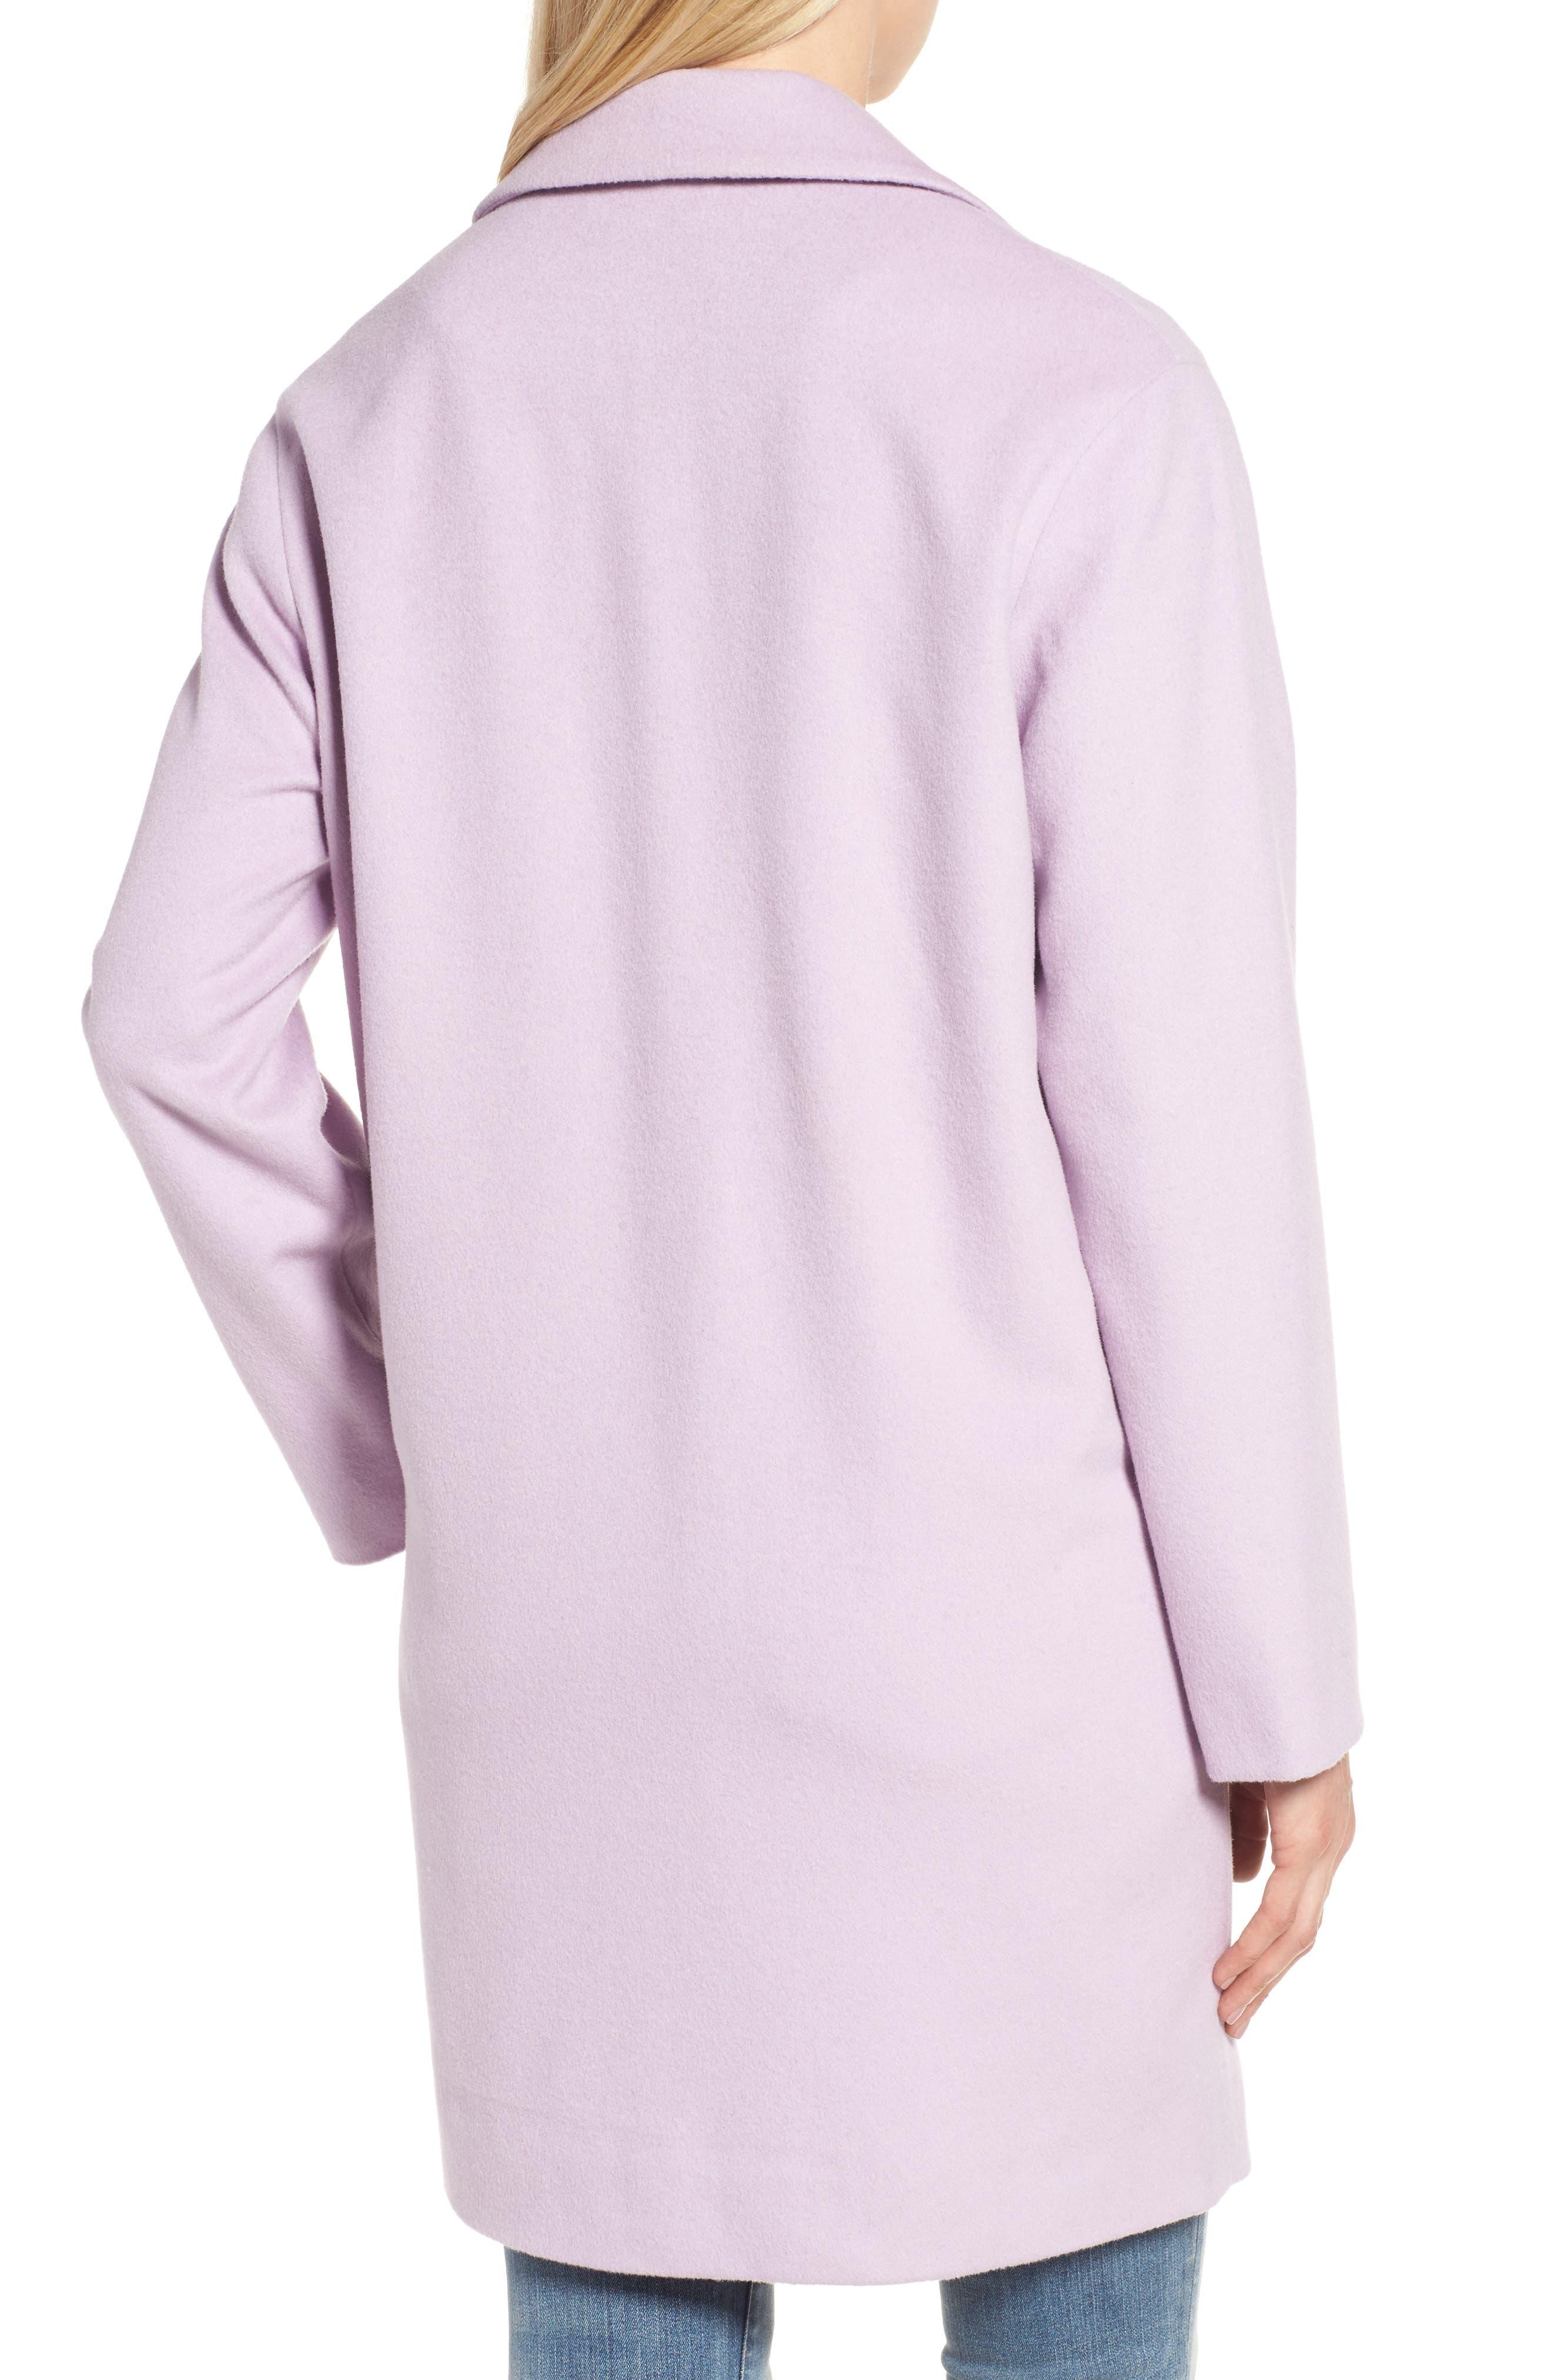 Wool Blend Coat,                             Alternate thumbnail 3, color,                             Icy Lavendar